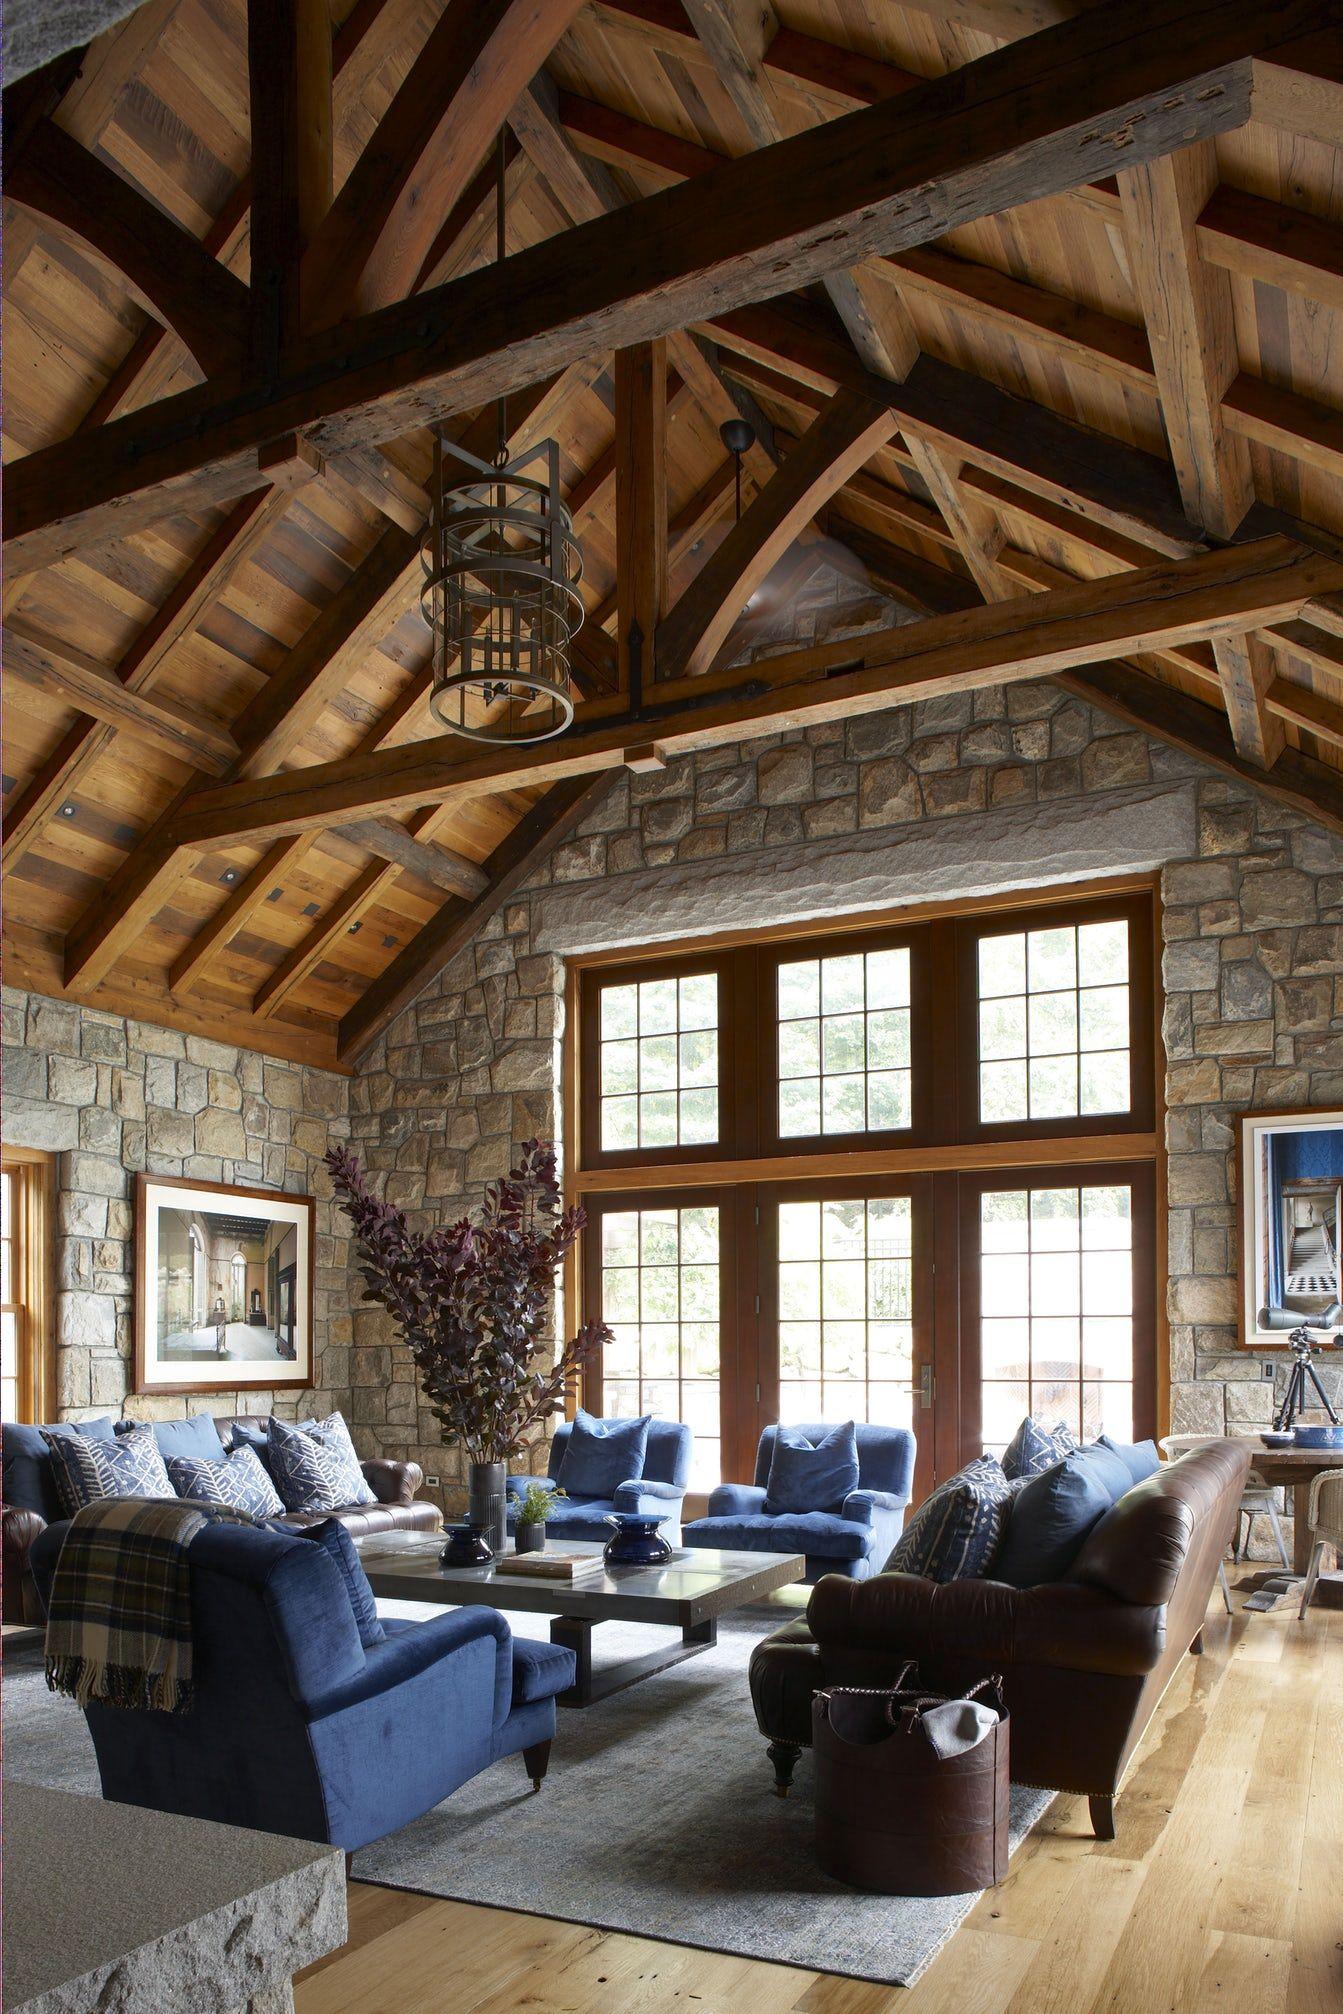 Rustic-wooden-design. +70 Unique Ceiling Design Ideas for Your Living Room